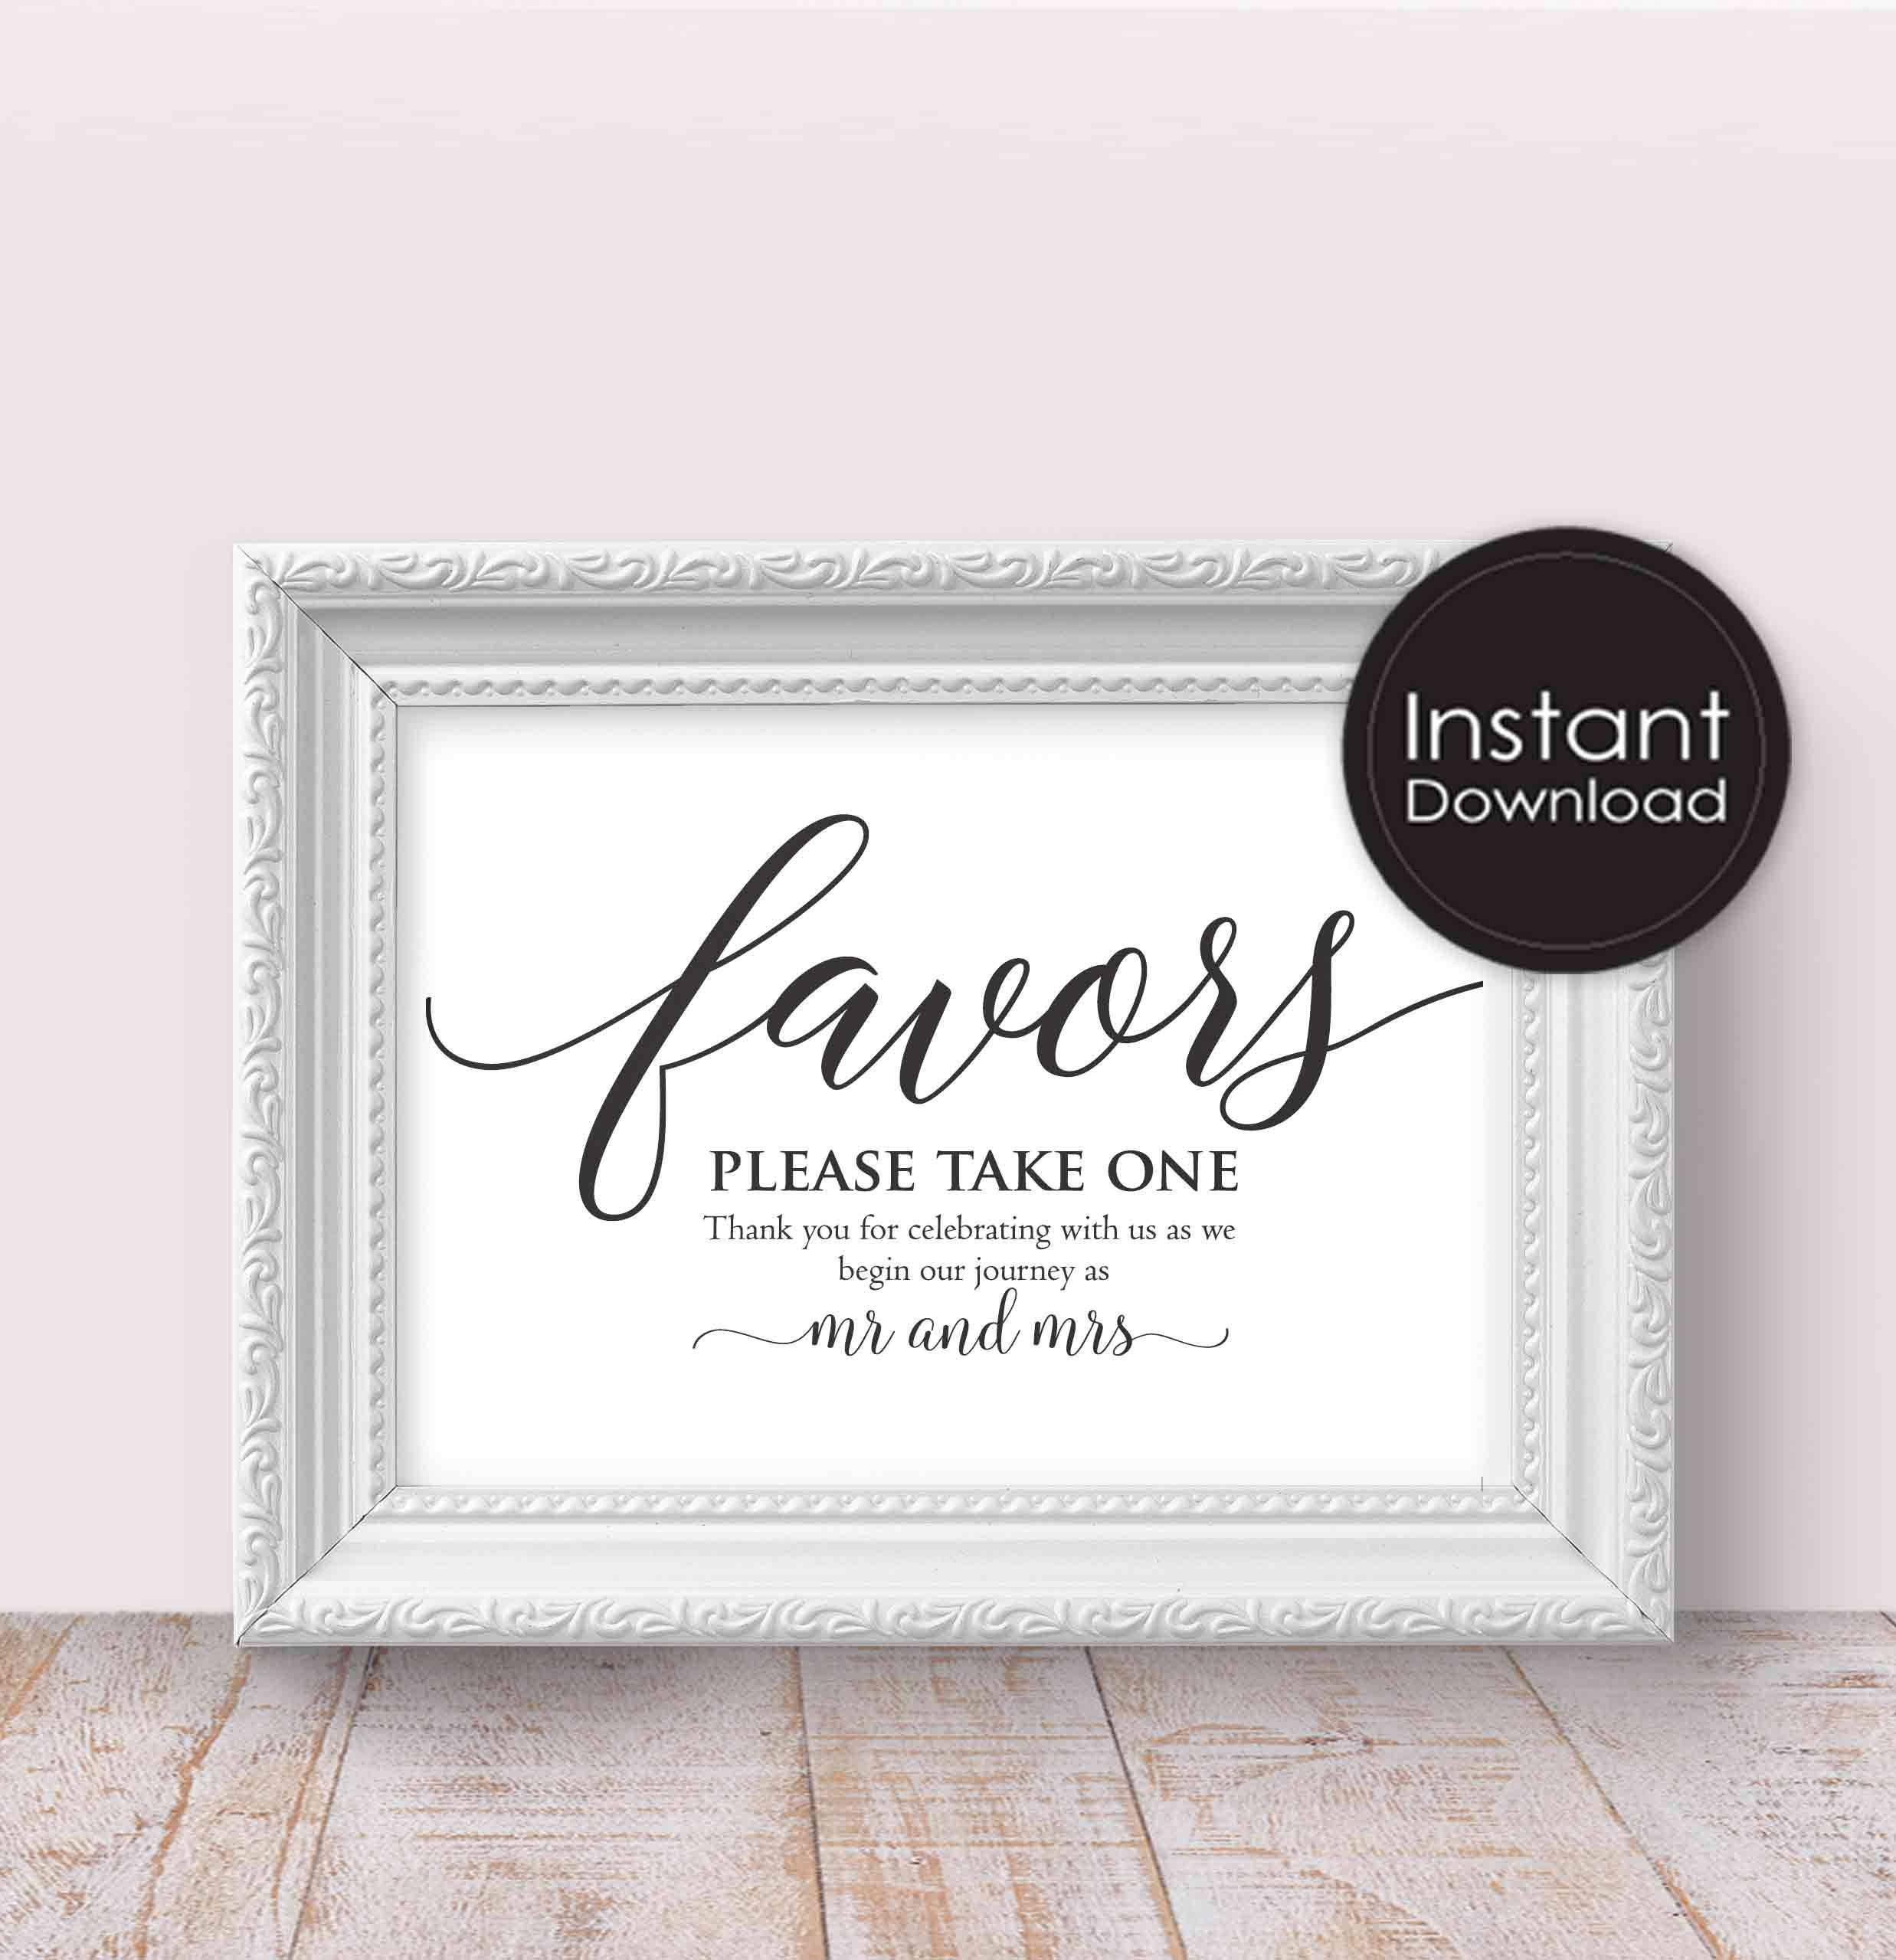 Wedding Favors Sign - Printable Wedding Decor, Wedding Signs ...